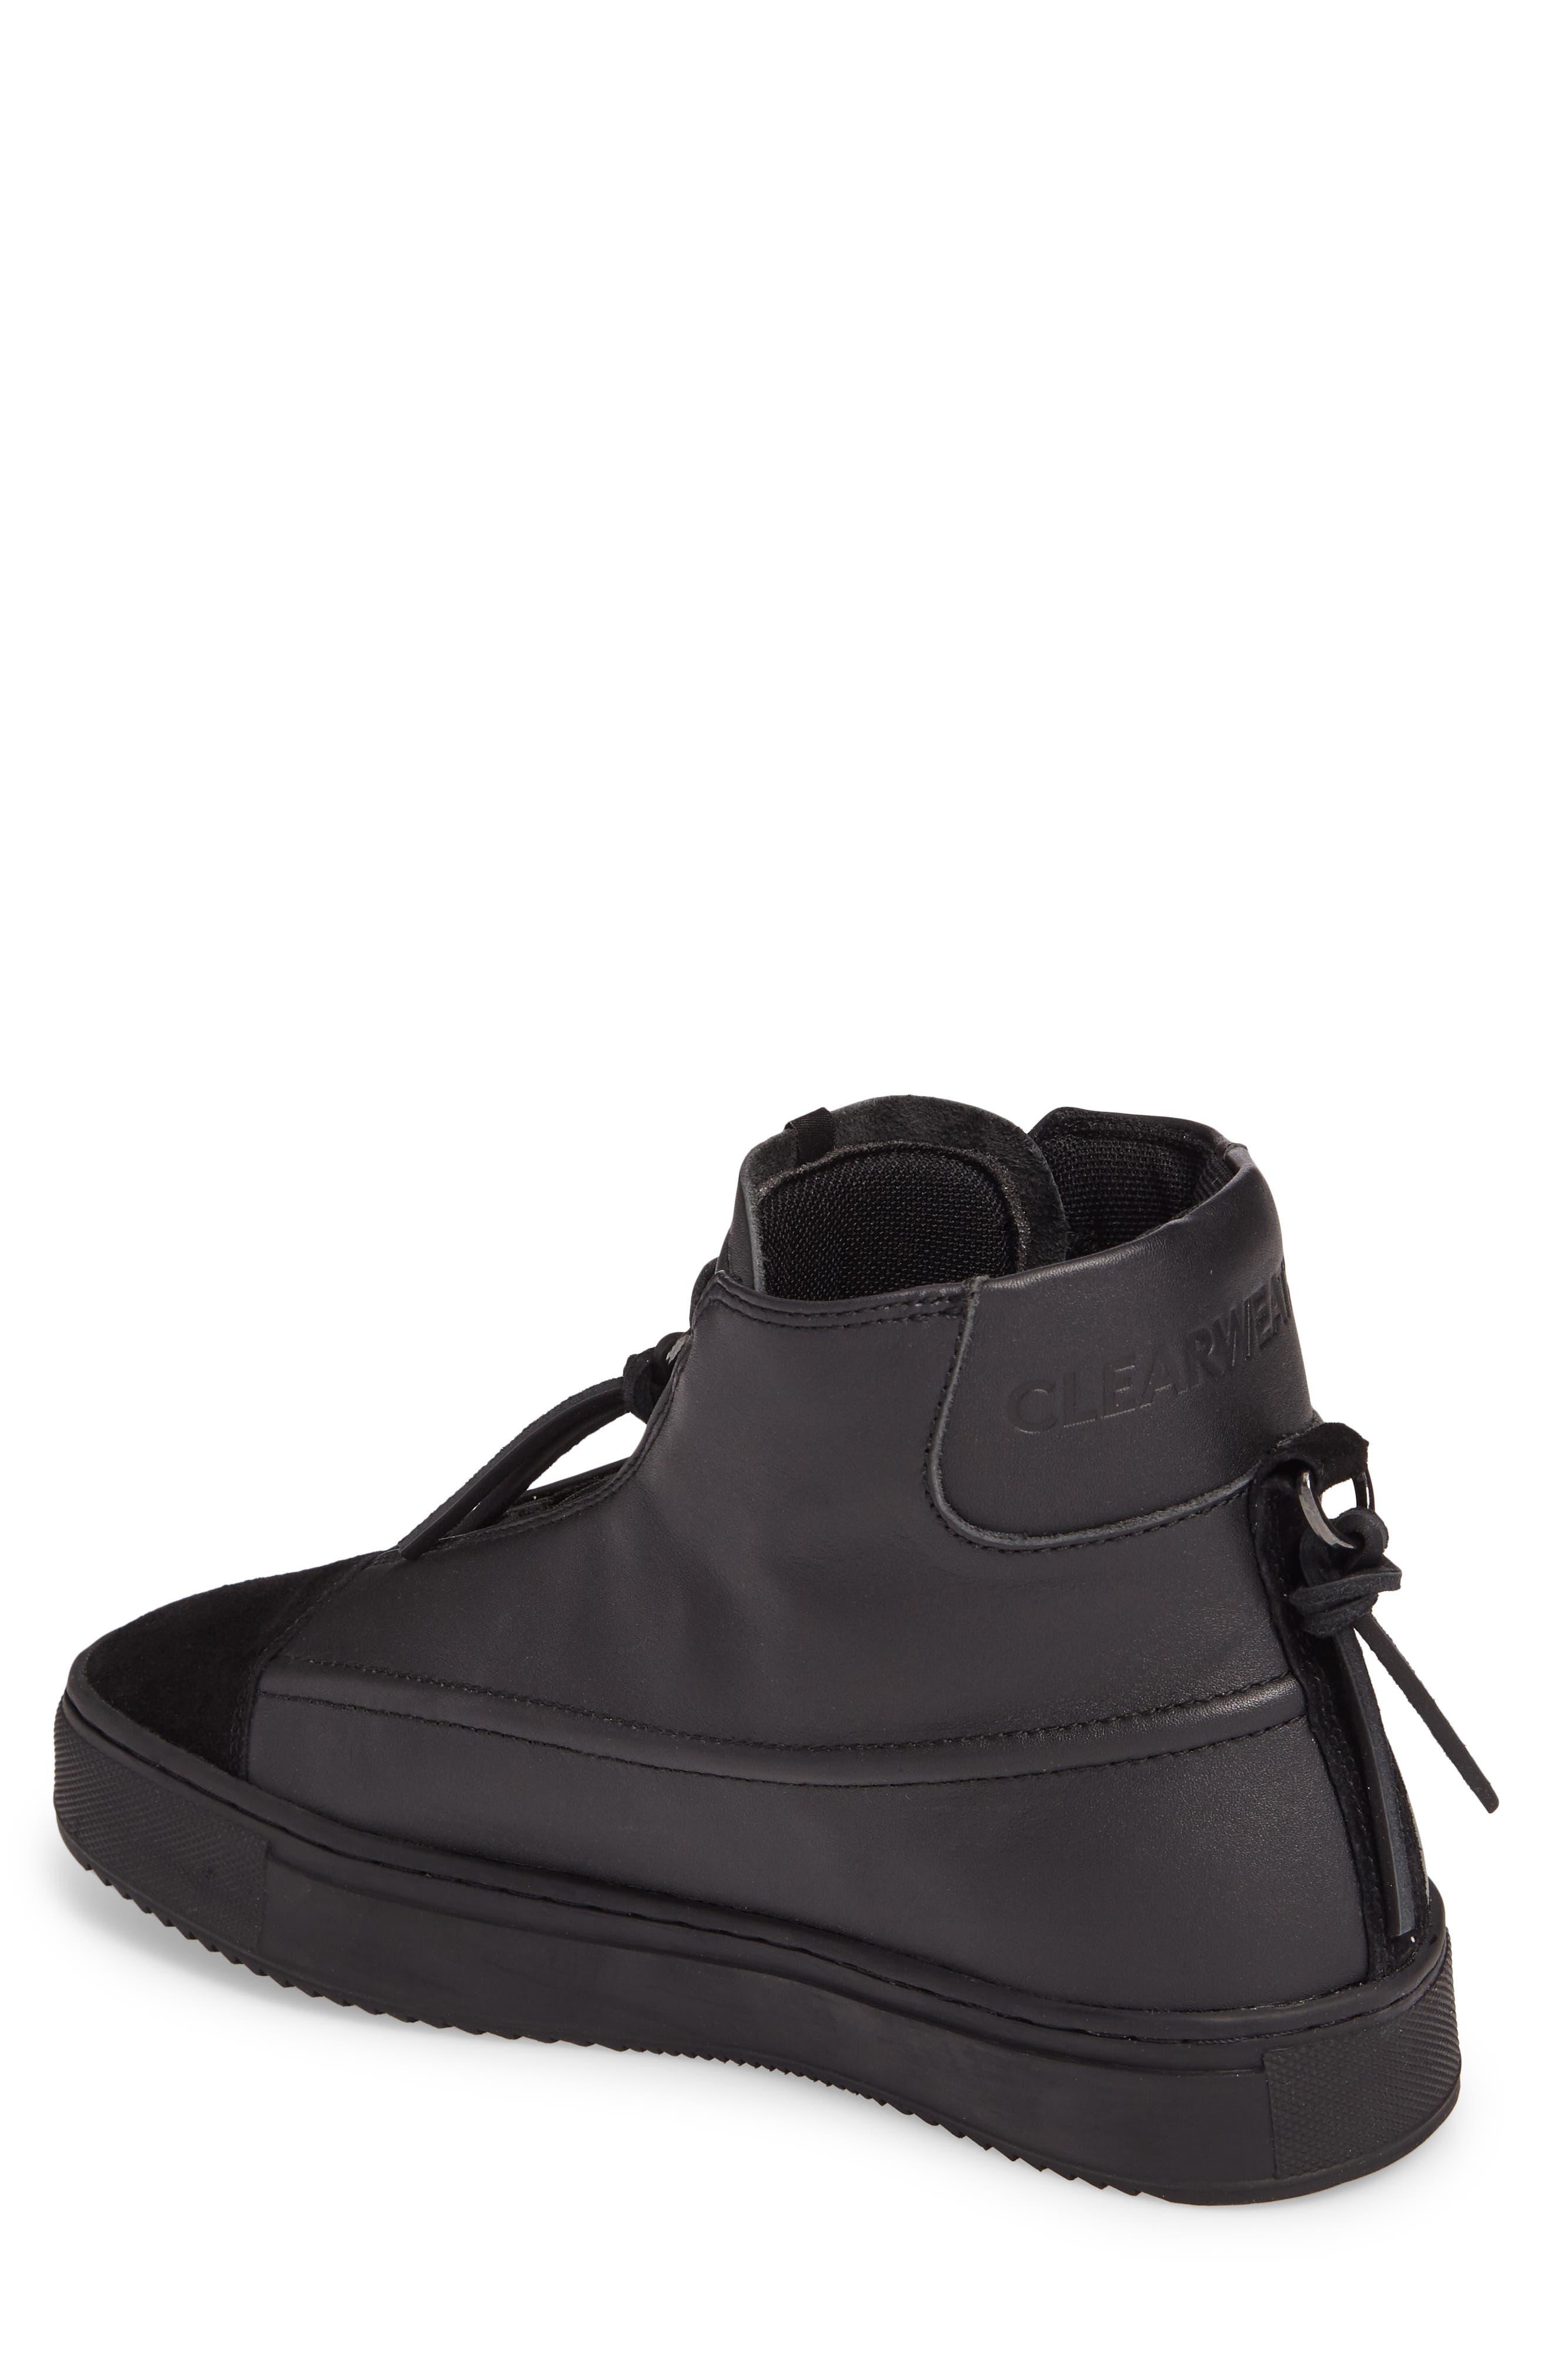 Sidney High Top Sneaker,                             Alternate thumbnail 2, color,                             Black